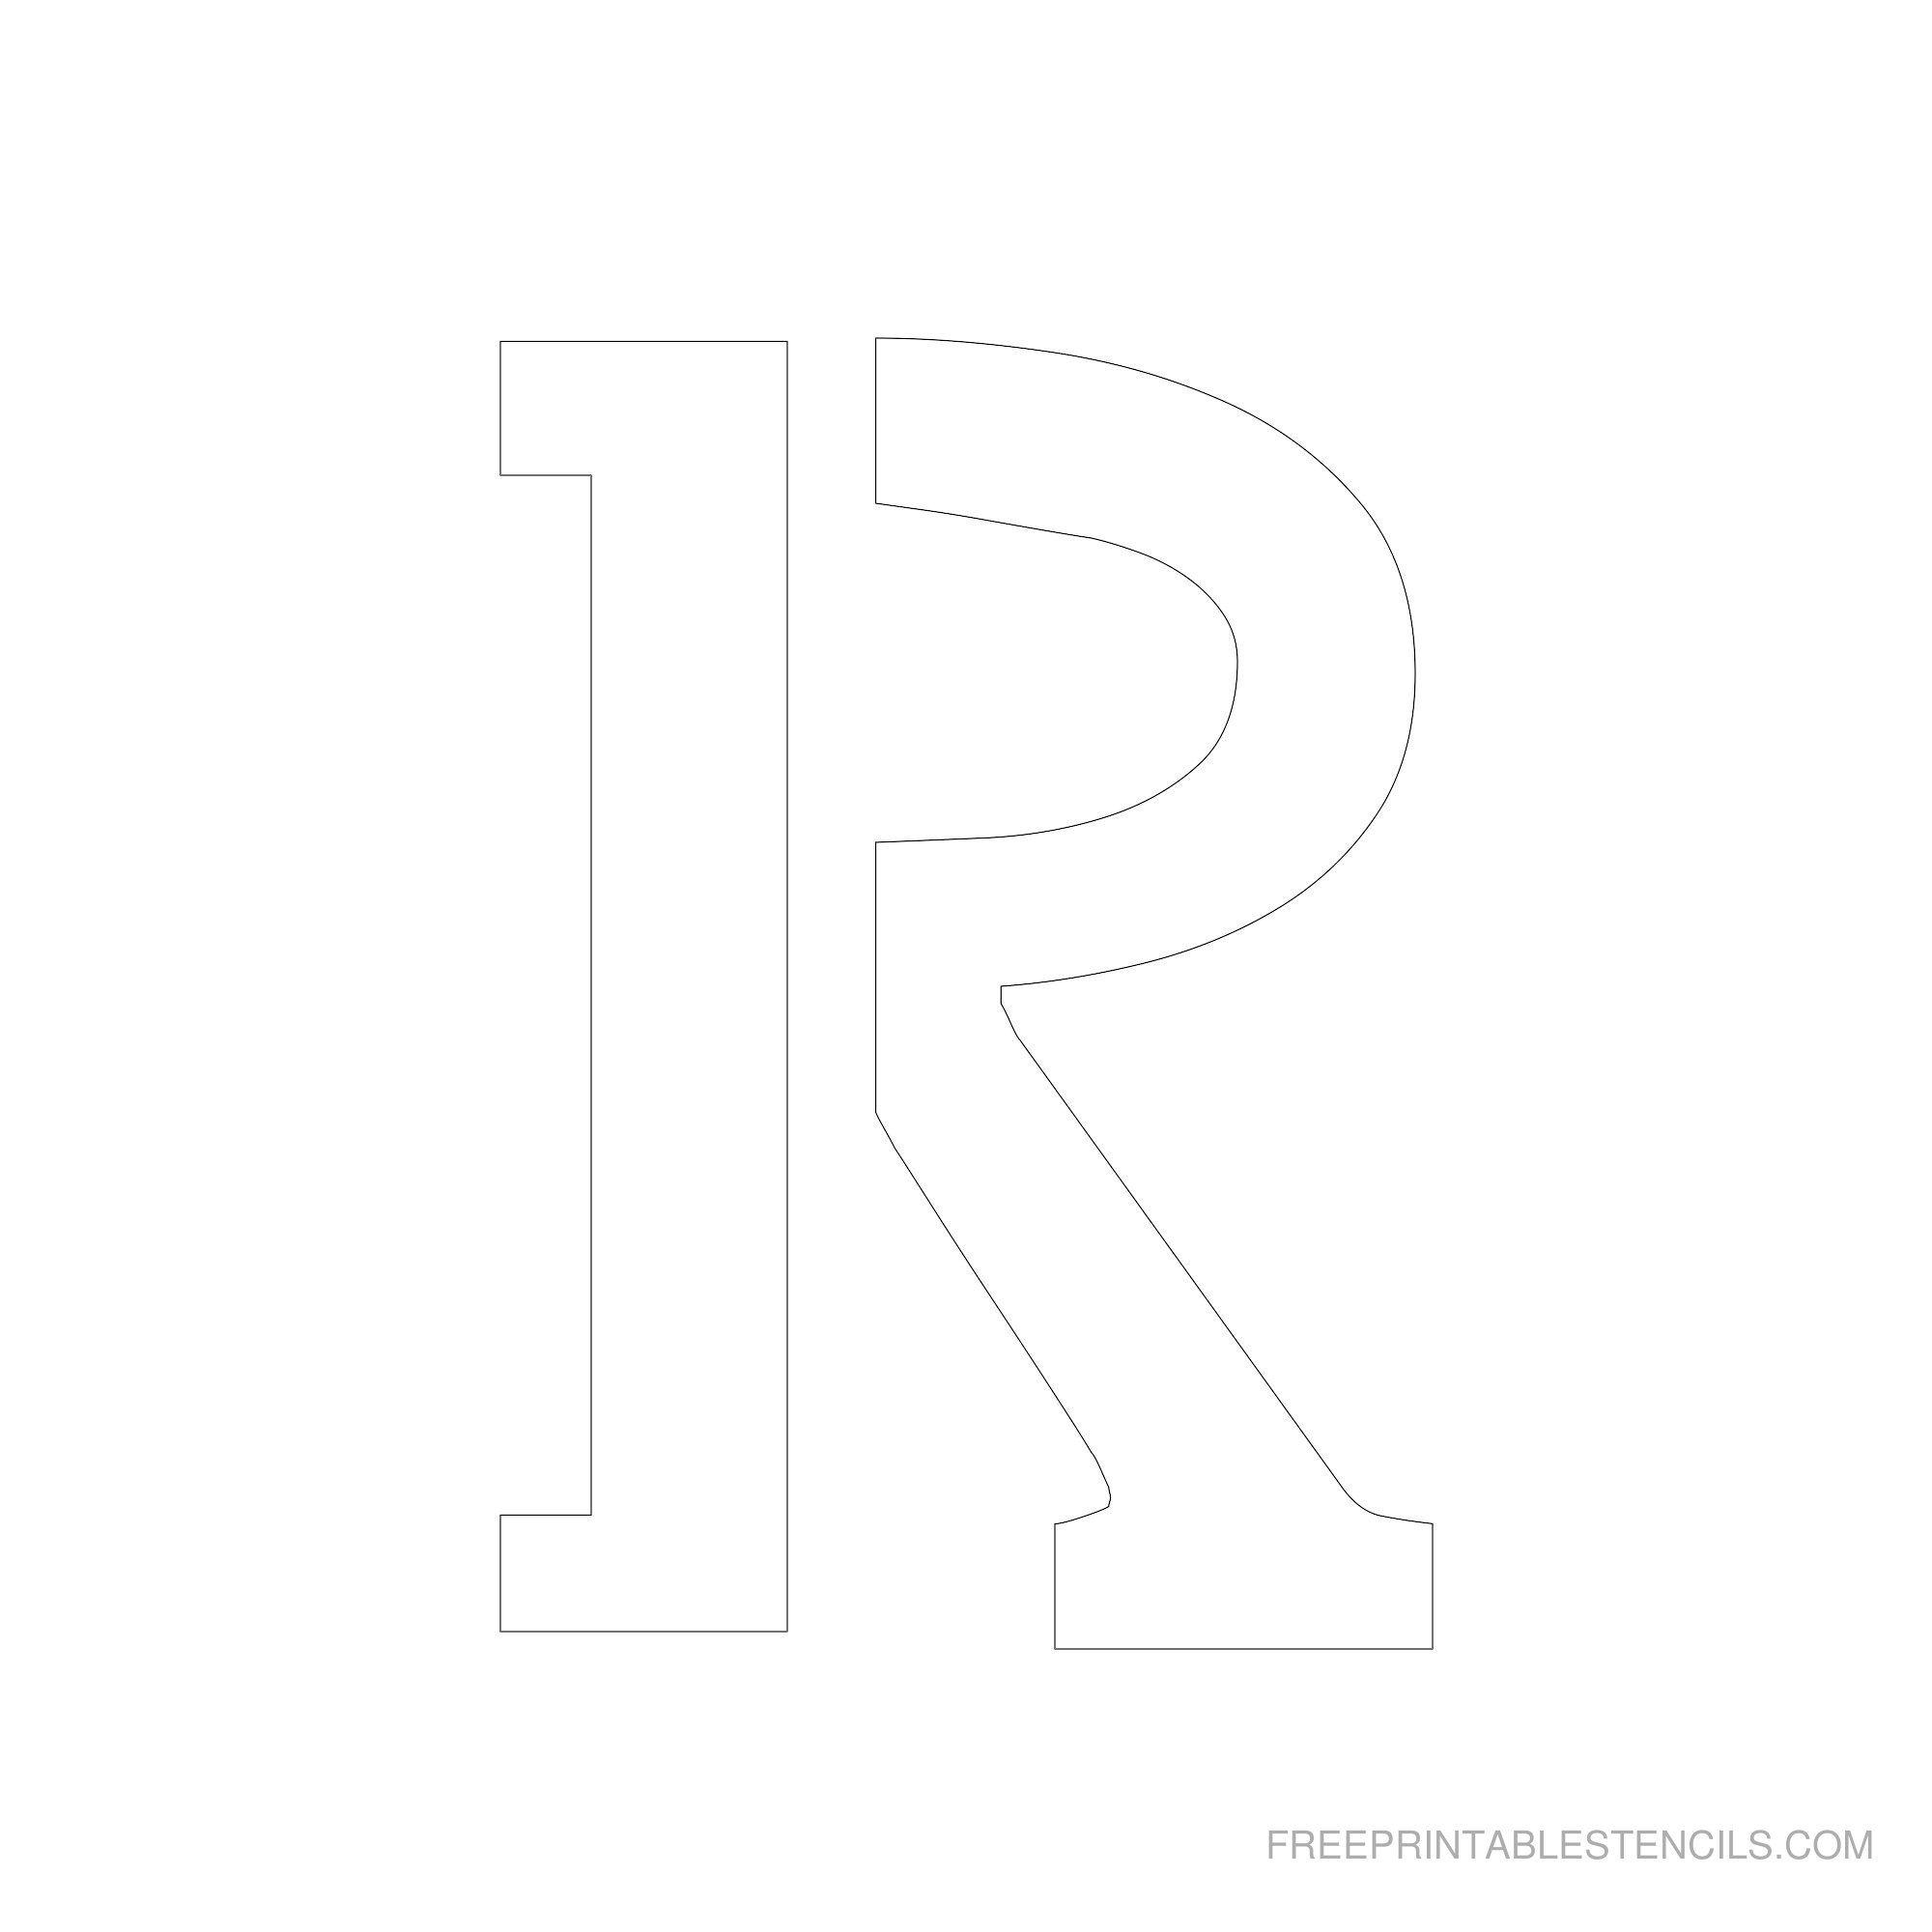 Free Printable Letter Stencils | Free Printable 6 Inch Alphabet - One Inch Stencils Printable Free